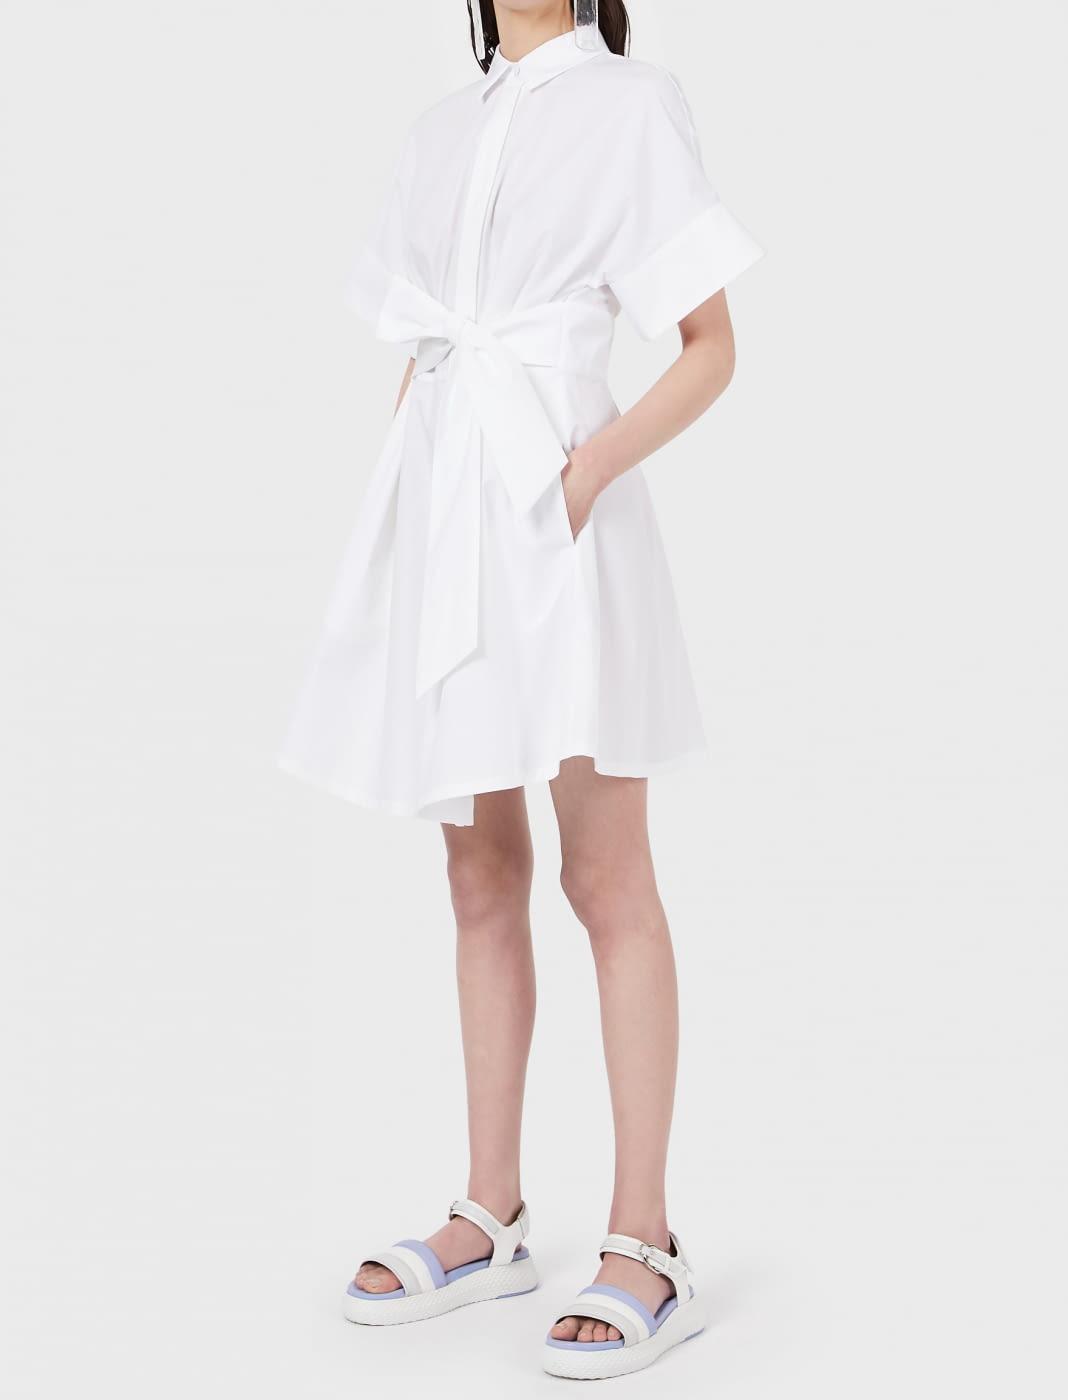 EMPORIO ARMANI vestido camisero blanco